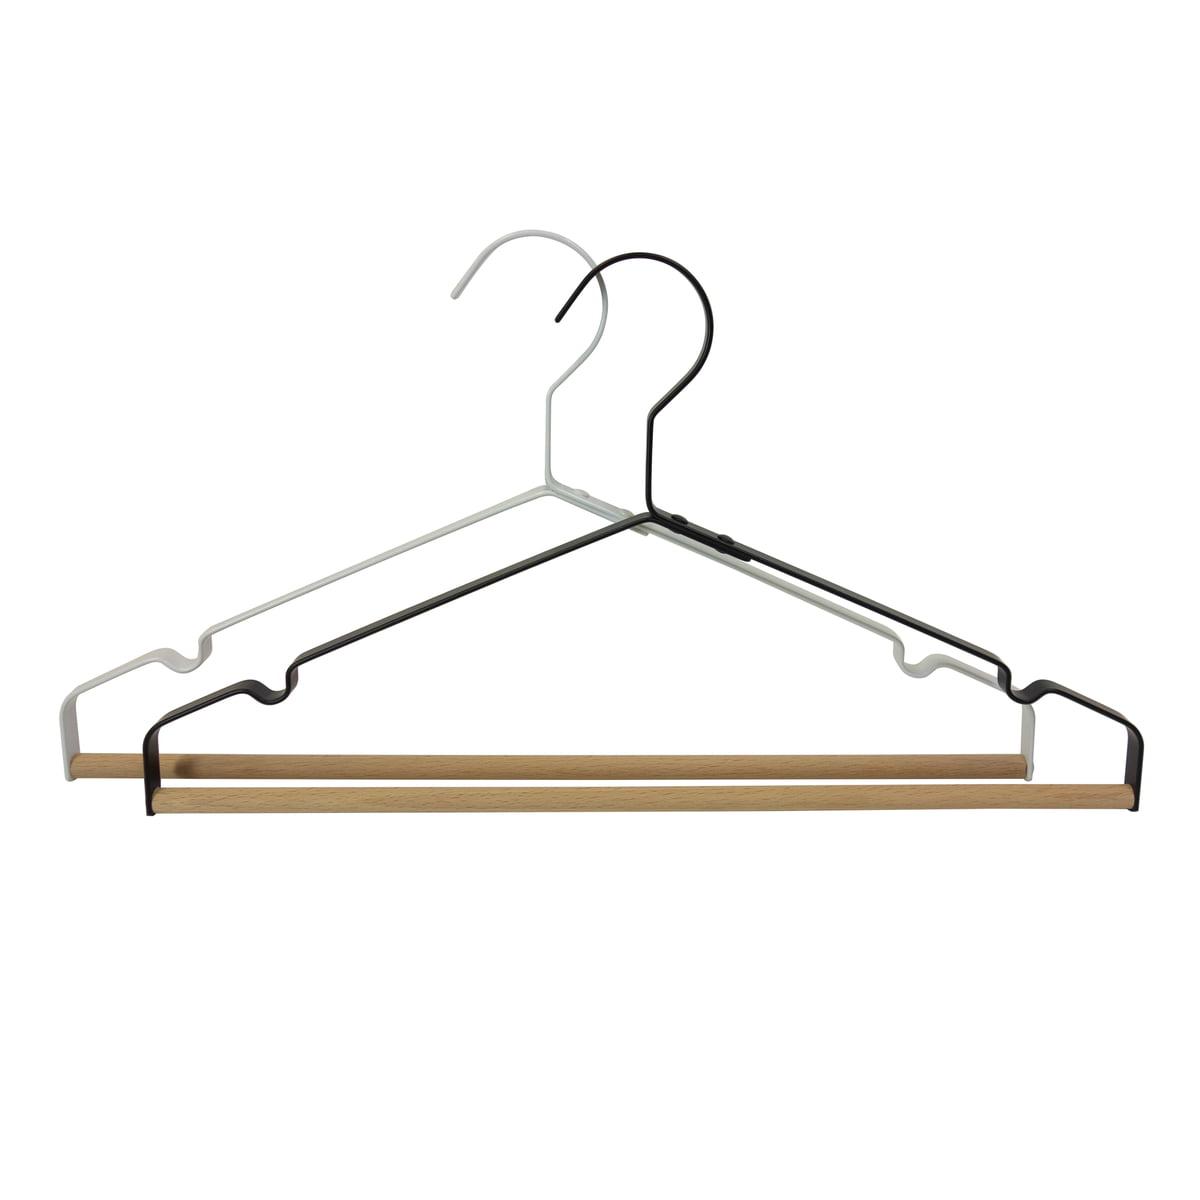 h 19 cm Peppermint Products Loop Hanger Kleiderbügel 3er-Set rot rot 41 x 3 cm